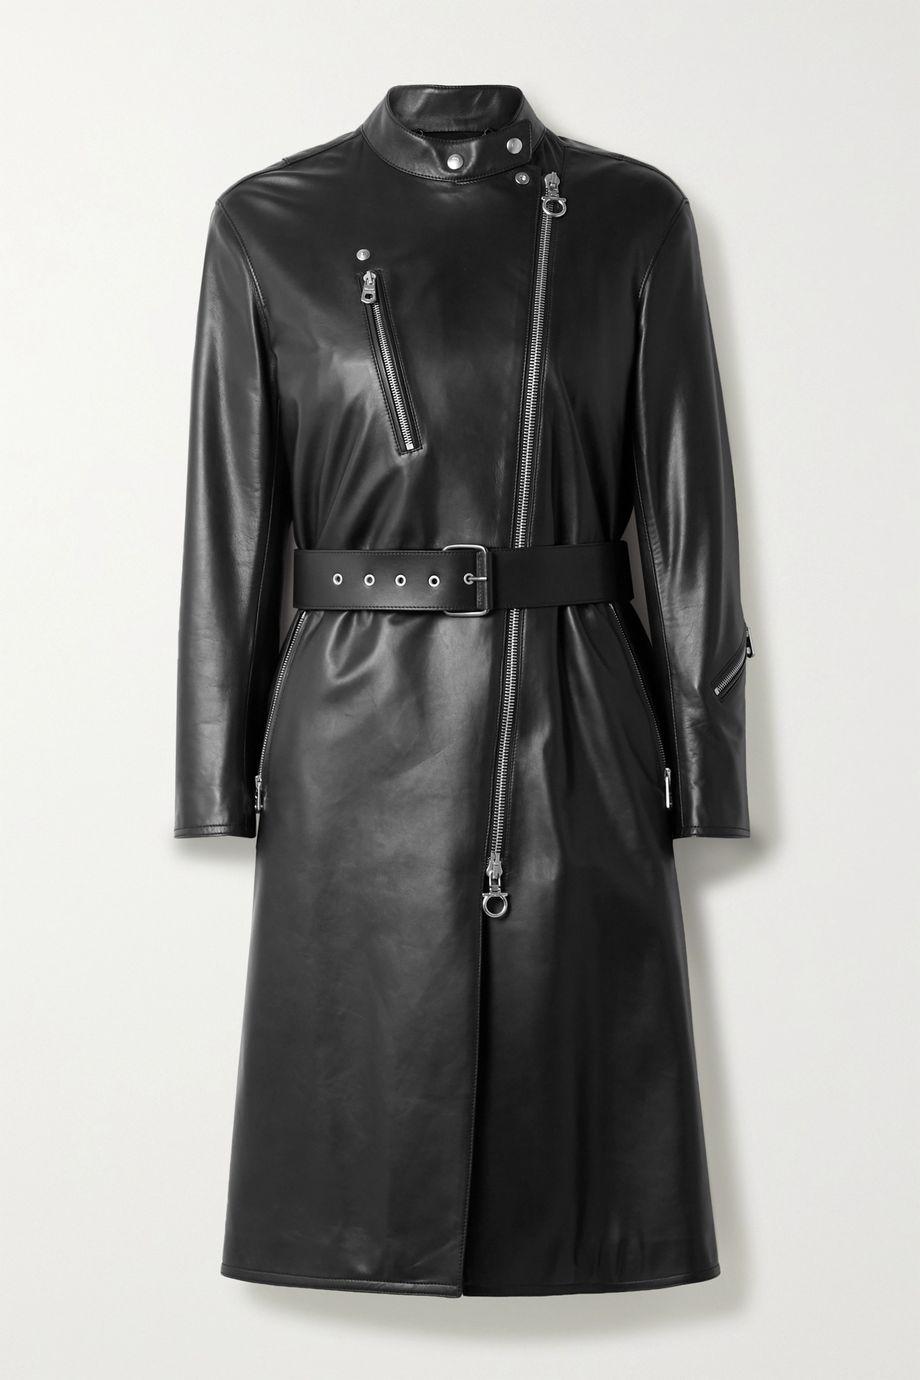 Salvatore Ferragamo Belted leather coat